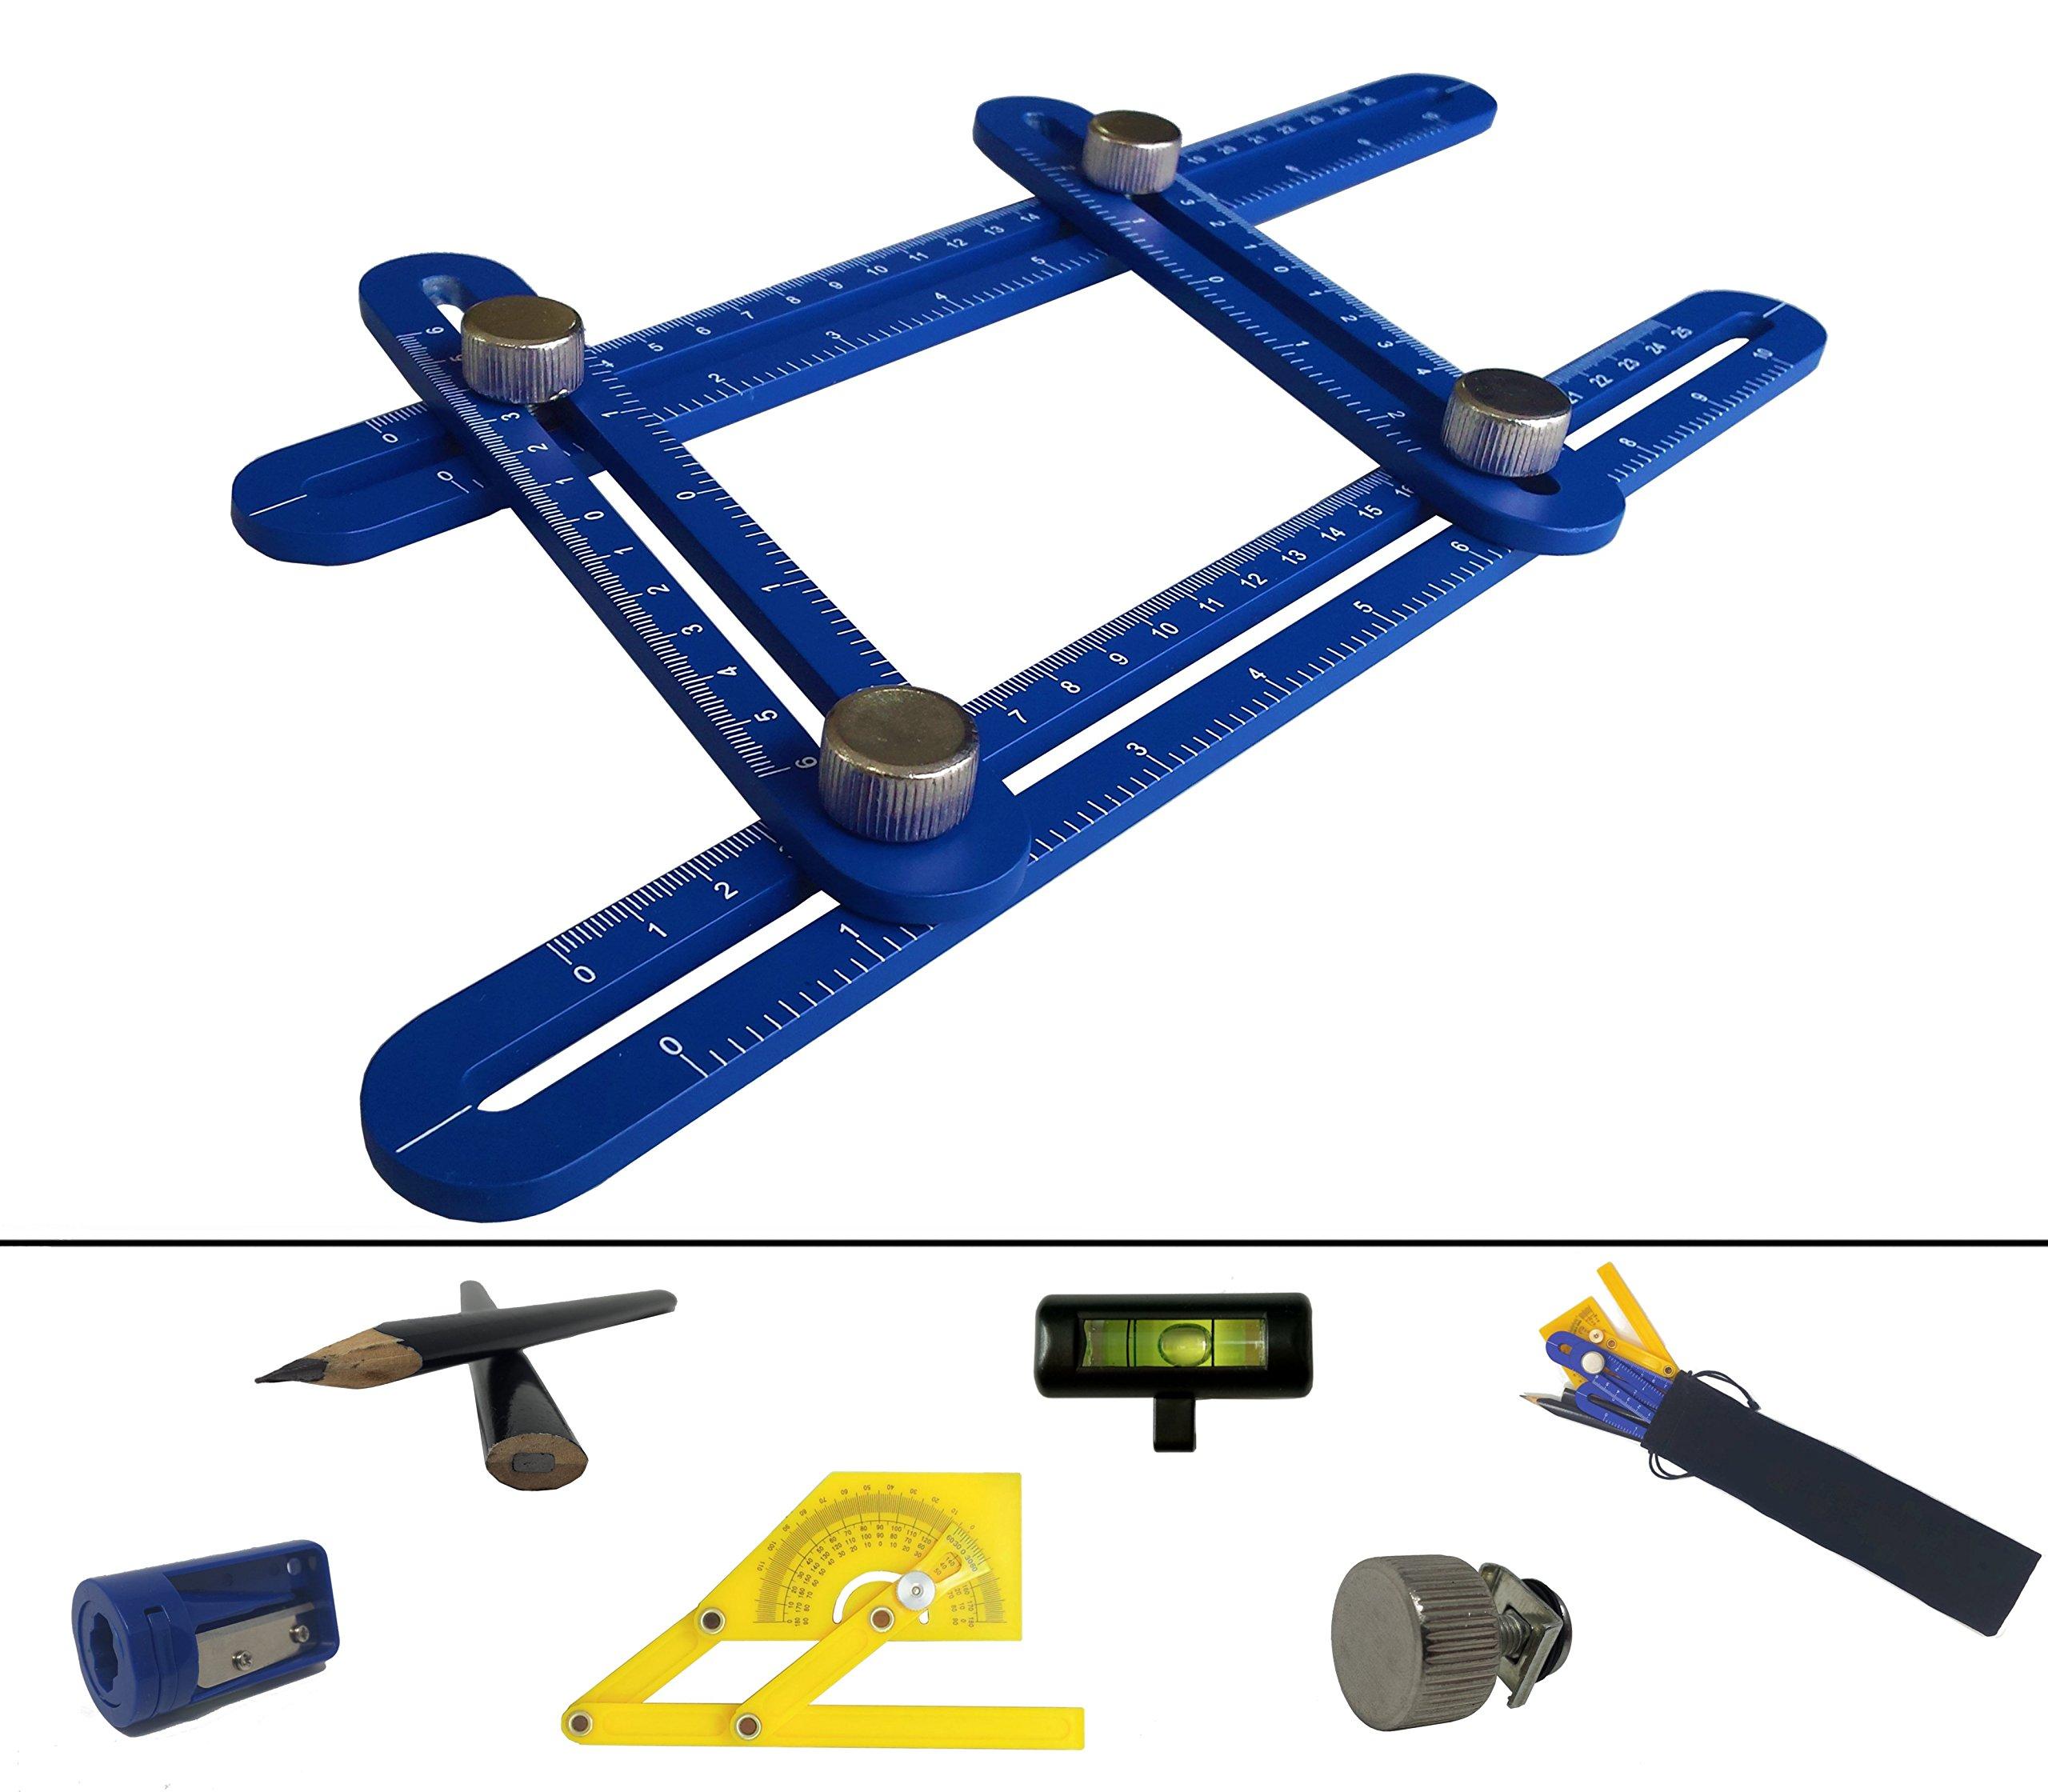 Universal Angularizer Template Tool | Adjustable Aluminum Alloy Multi Angle Measuring Ruler | Professional Any Angle Multi Function Ruler Set